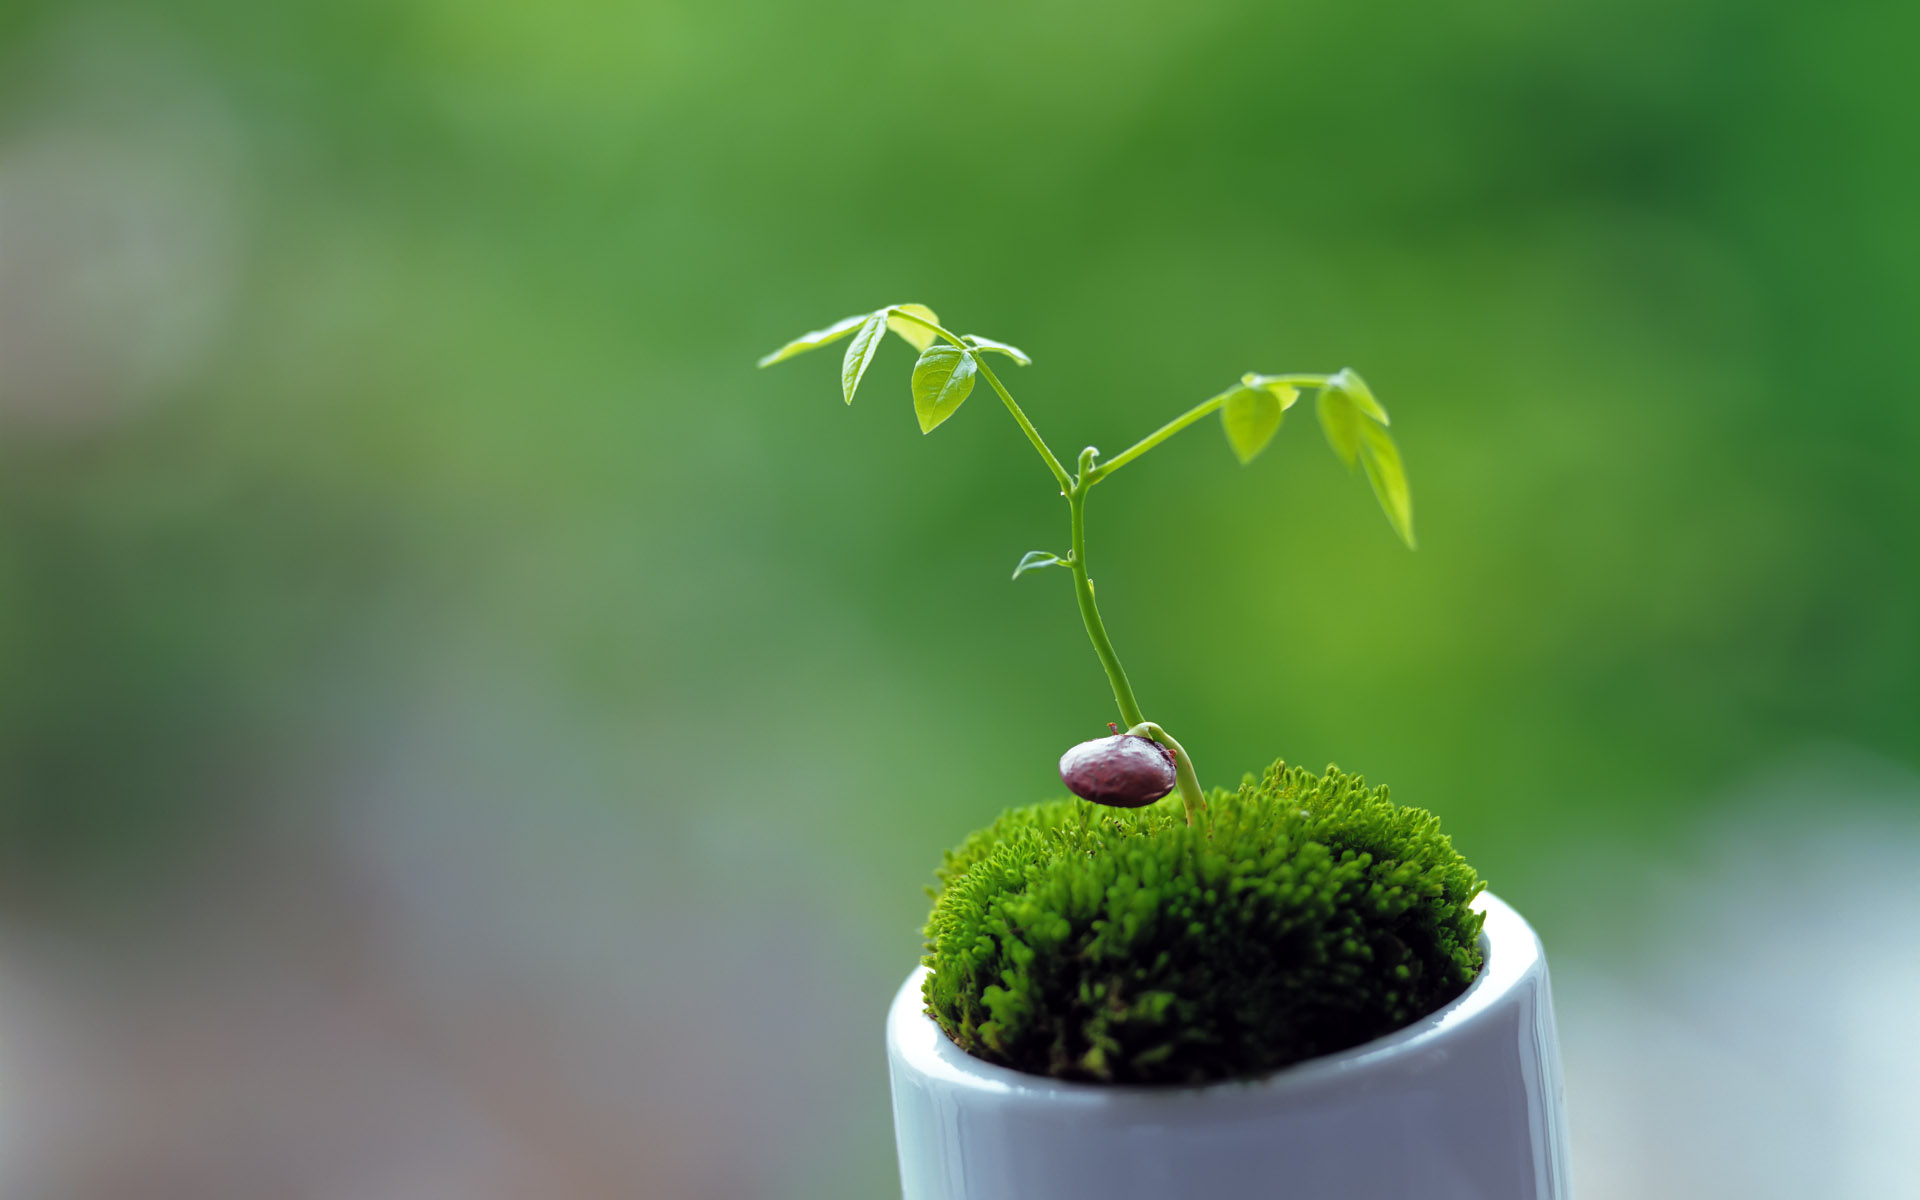 Cute Plant Wallpaper